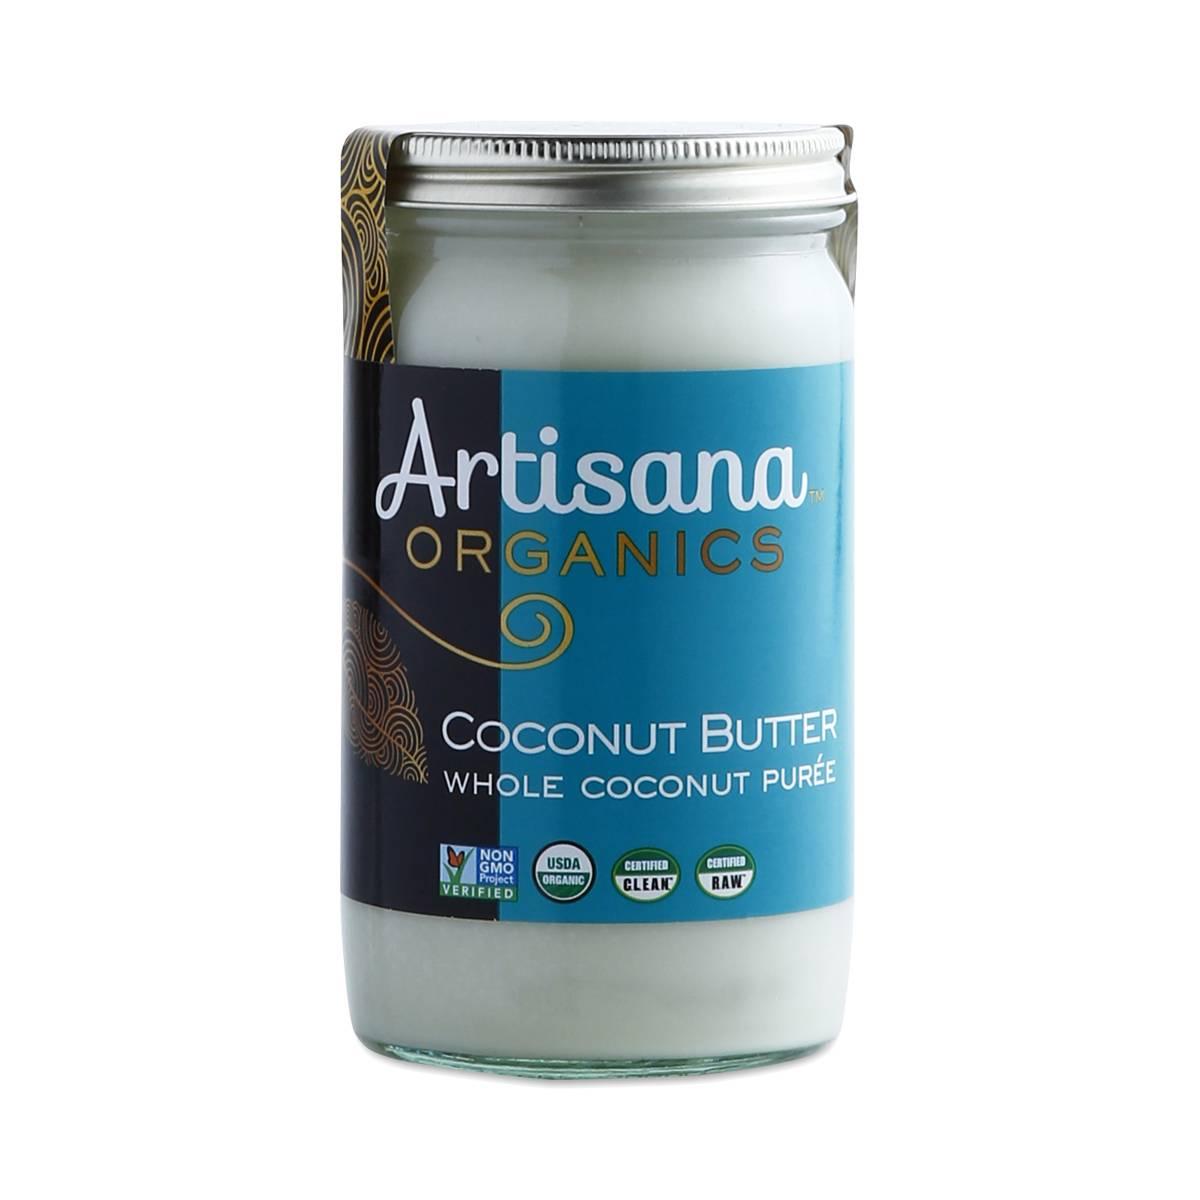 Coconut butter brands